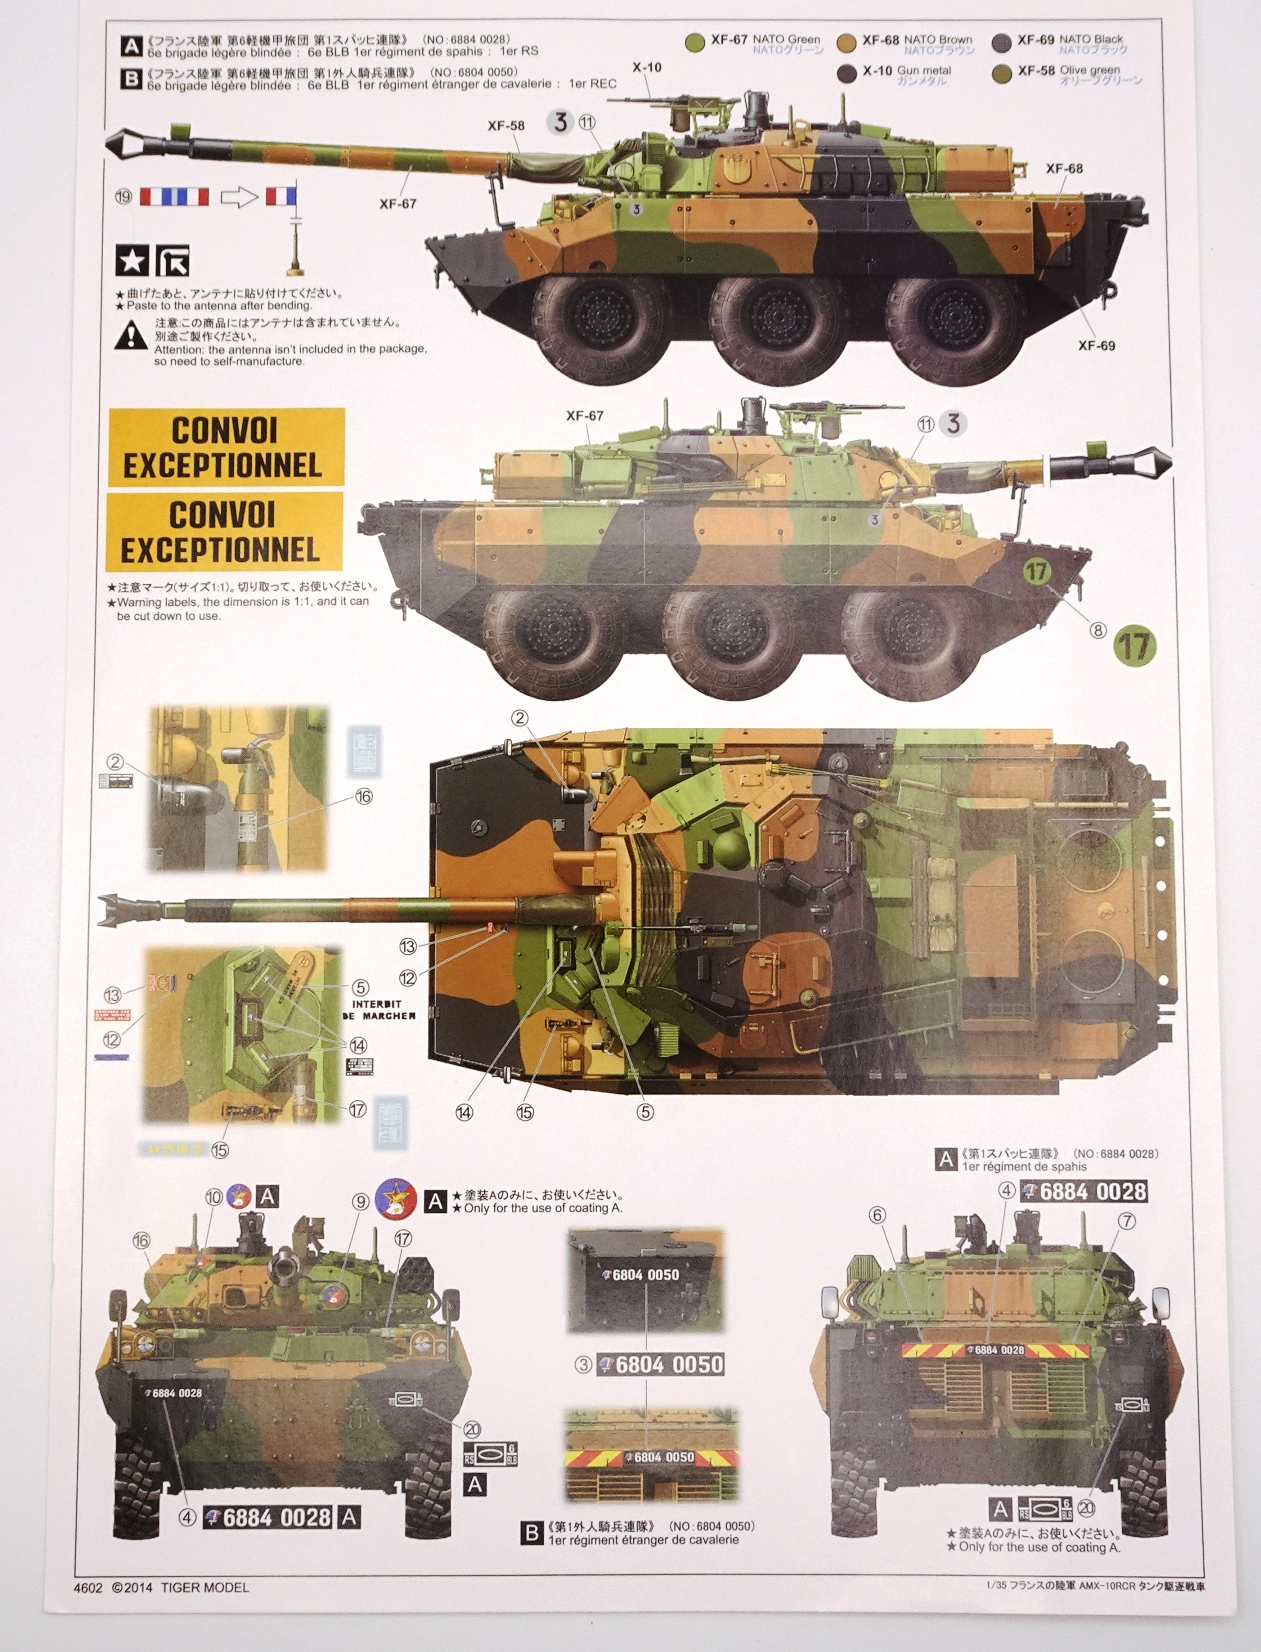 [Tiger Model] AMX-10RCR réf. 4602 - 1/35 Amx10-plan-6